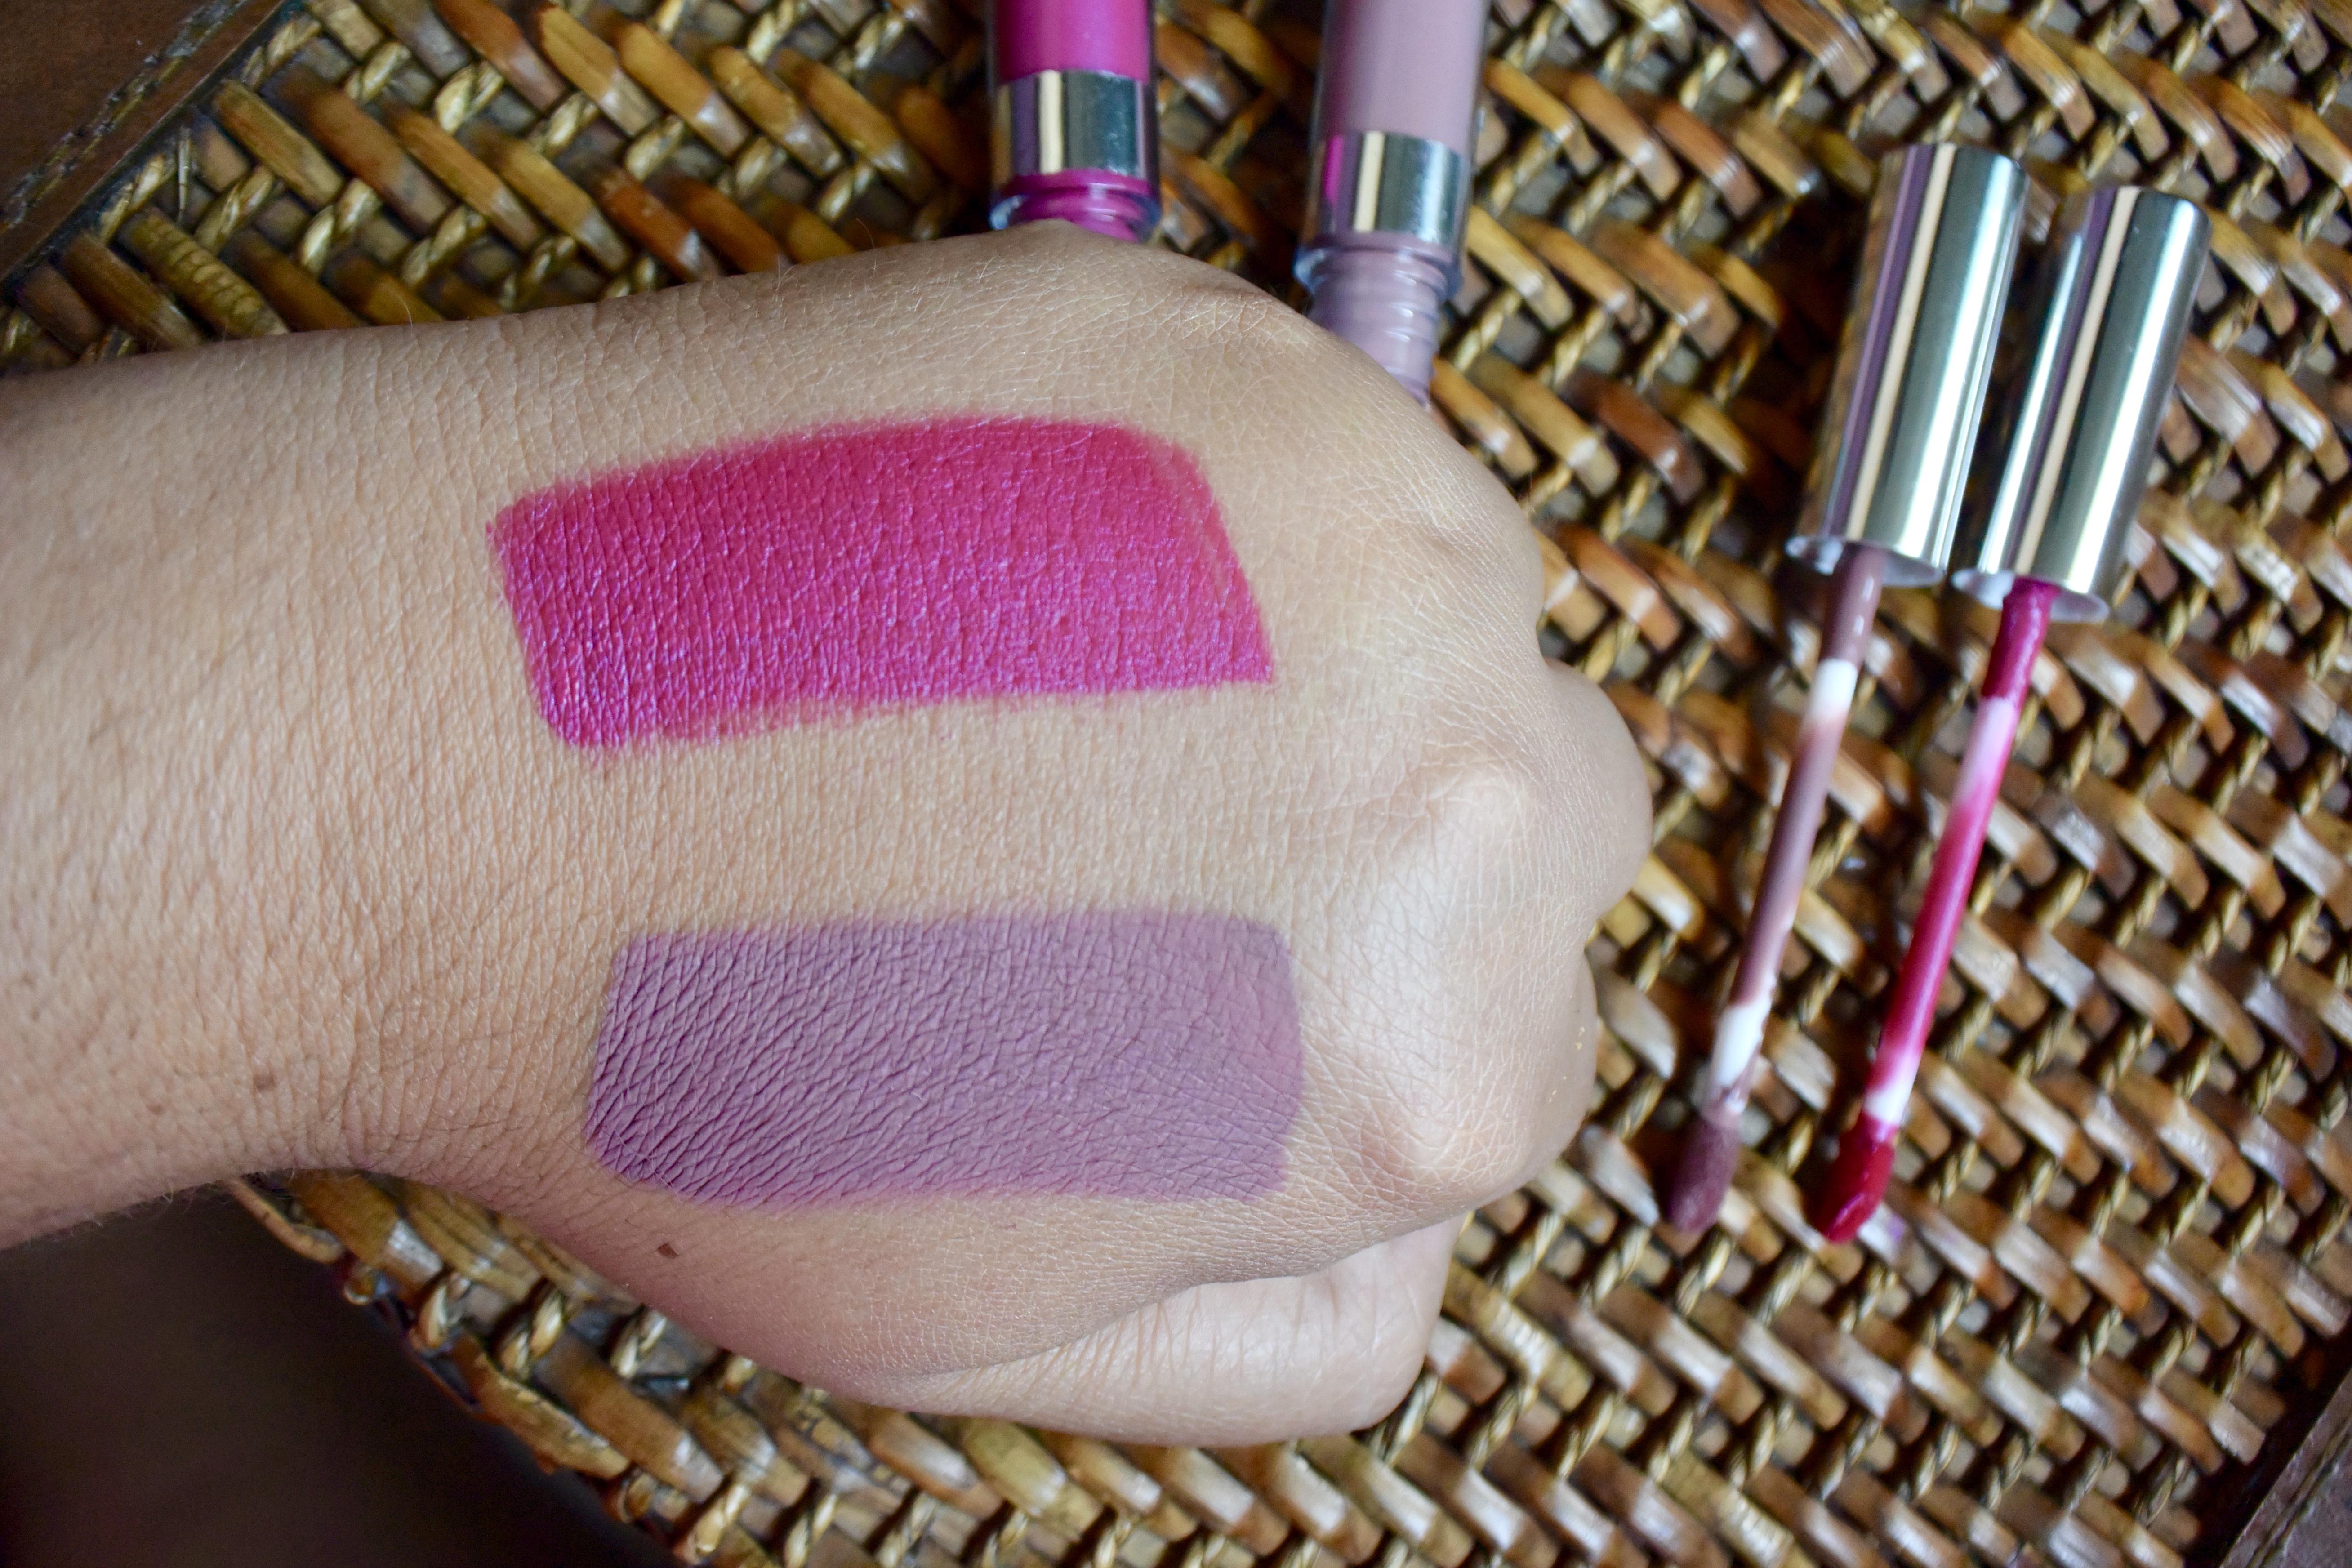 ColourPop Ultra Matte Vs Ultra Satin Lips